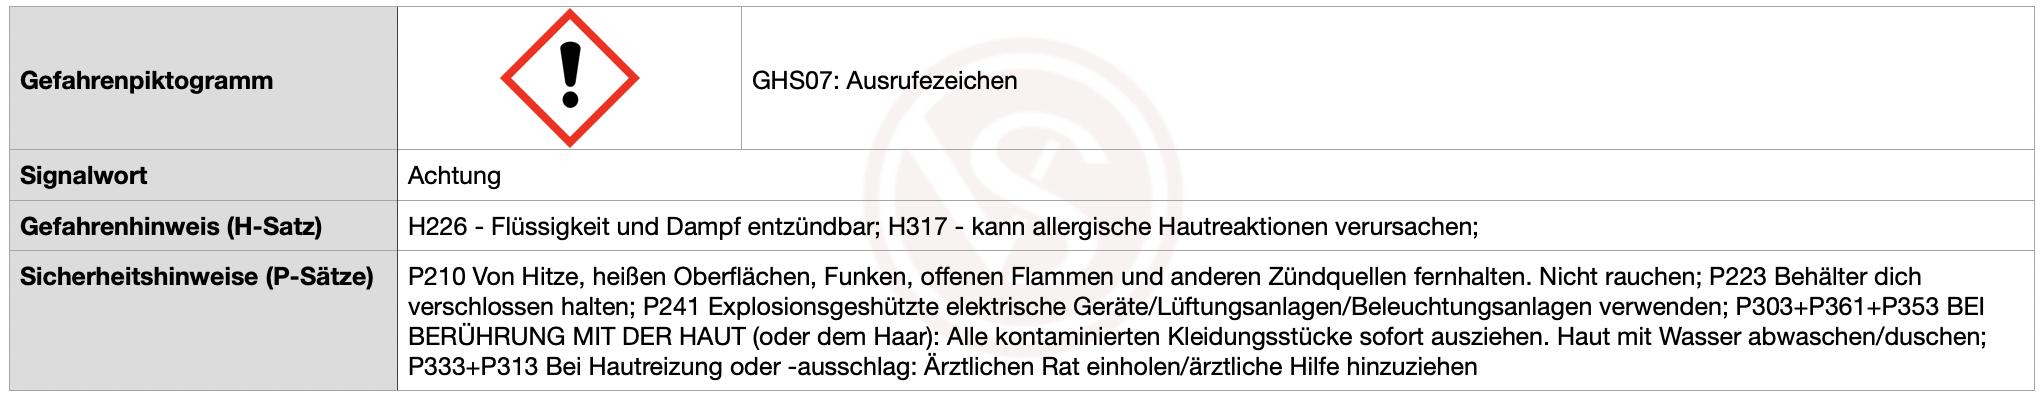 Achtung-H226-H317